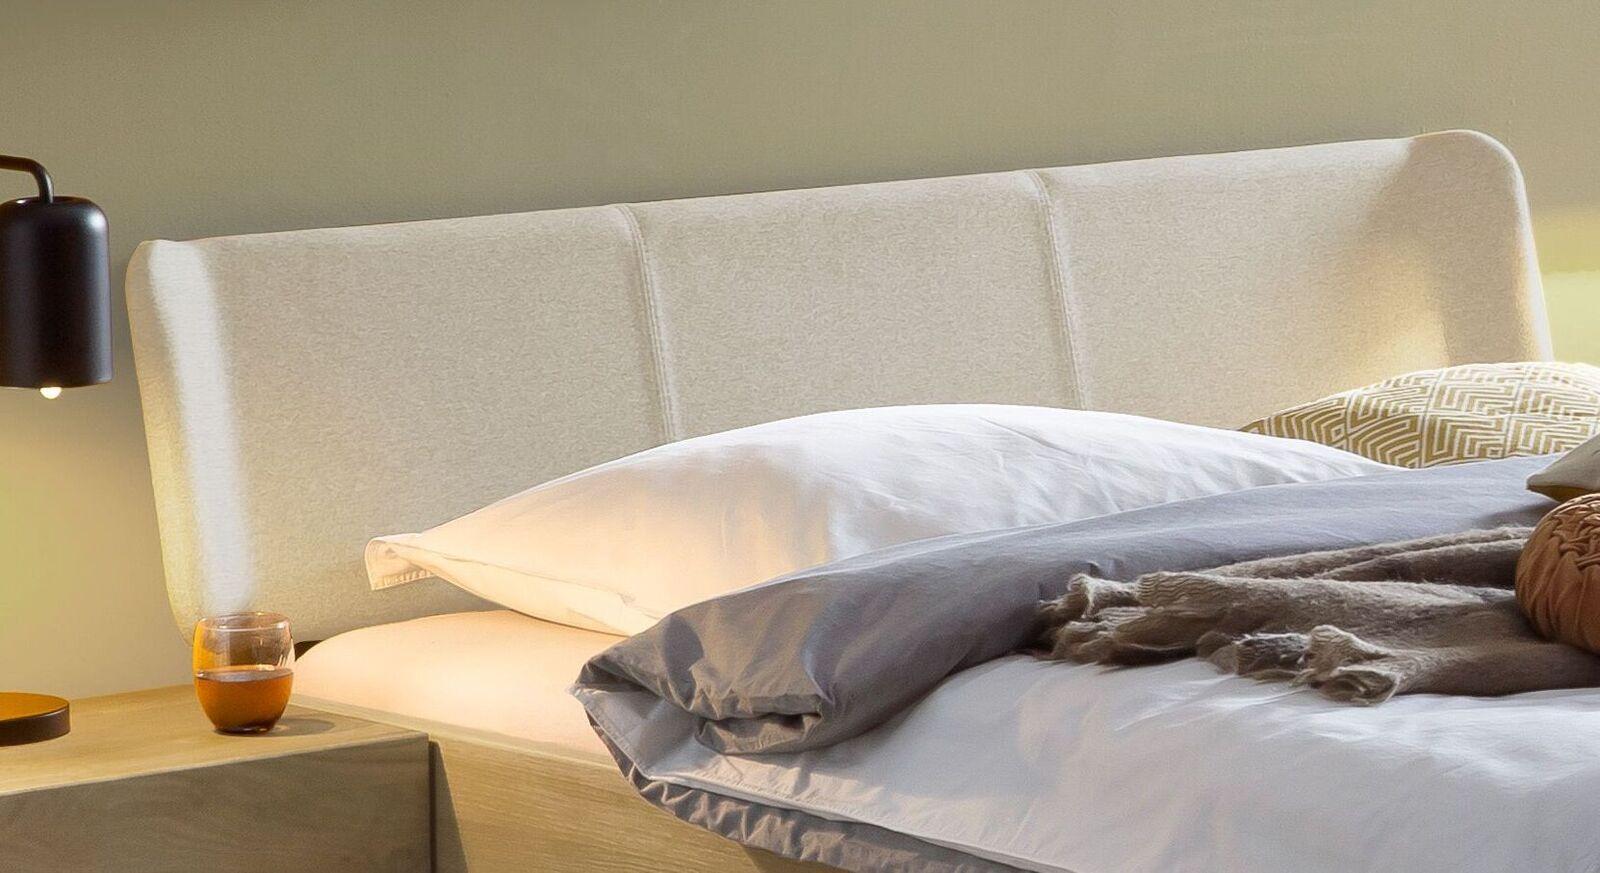 Bett Ubaldo Kopfteil mit Fischgrät-Veloursbezug in Beige